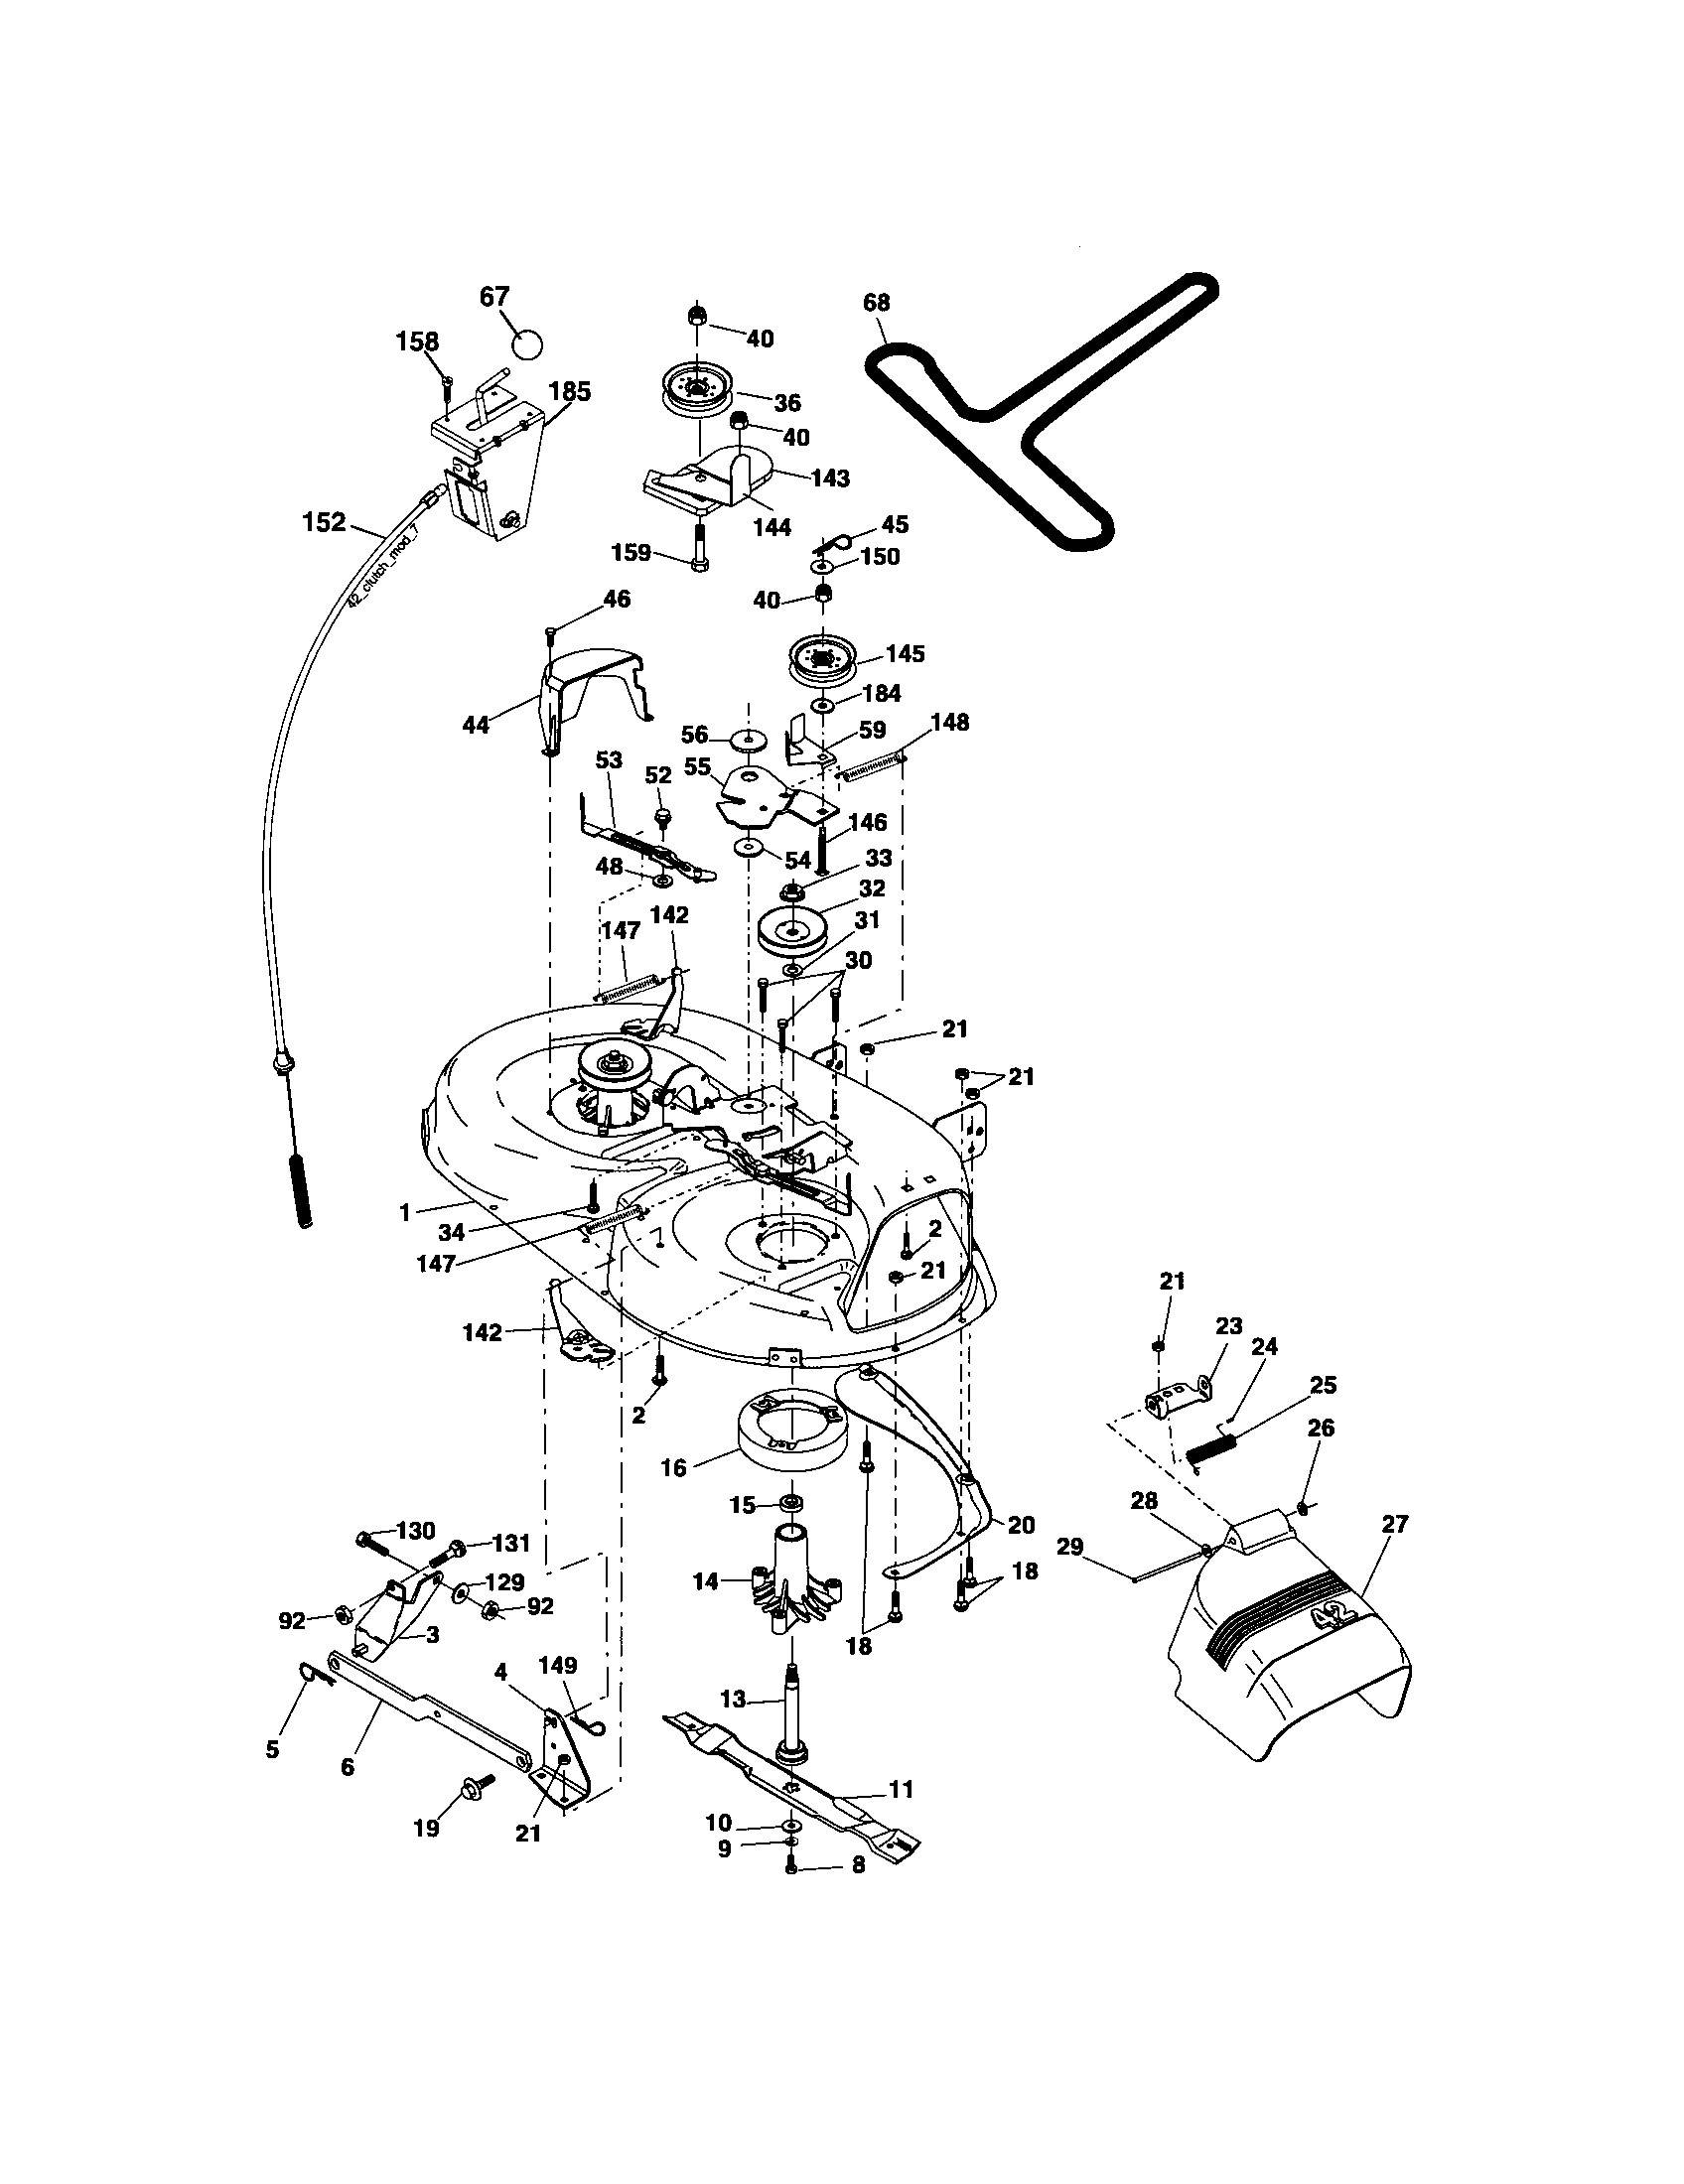 Parts Diagram Craftsman 17.5 Hp Lawn Mower We Have Craftsman 17 5 Hp 42 Inch Mower 6 Speed Transaxle 2006 Model 917 It Only Cuts Of Parts Diagram Craftsman 17.5 Hp Lawn Mower